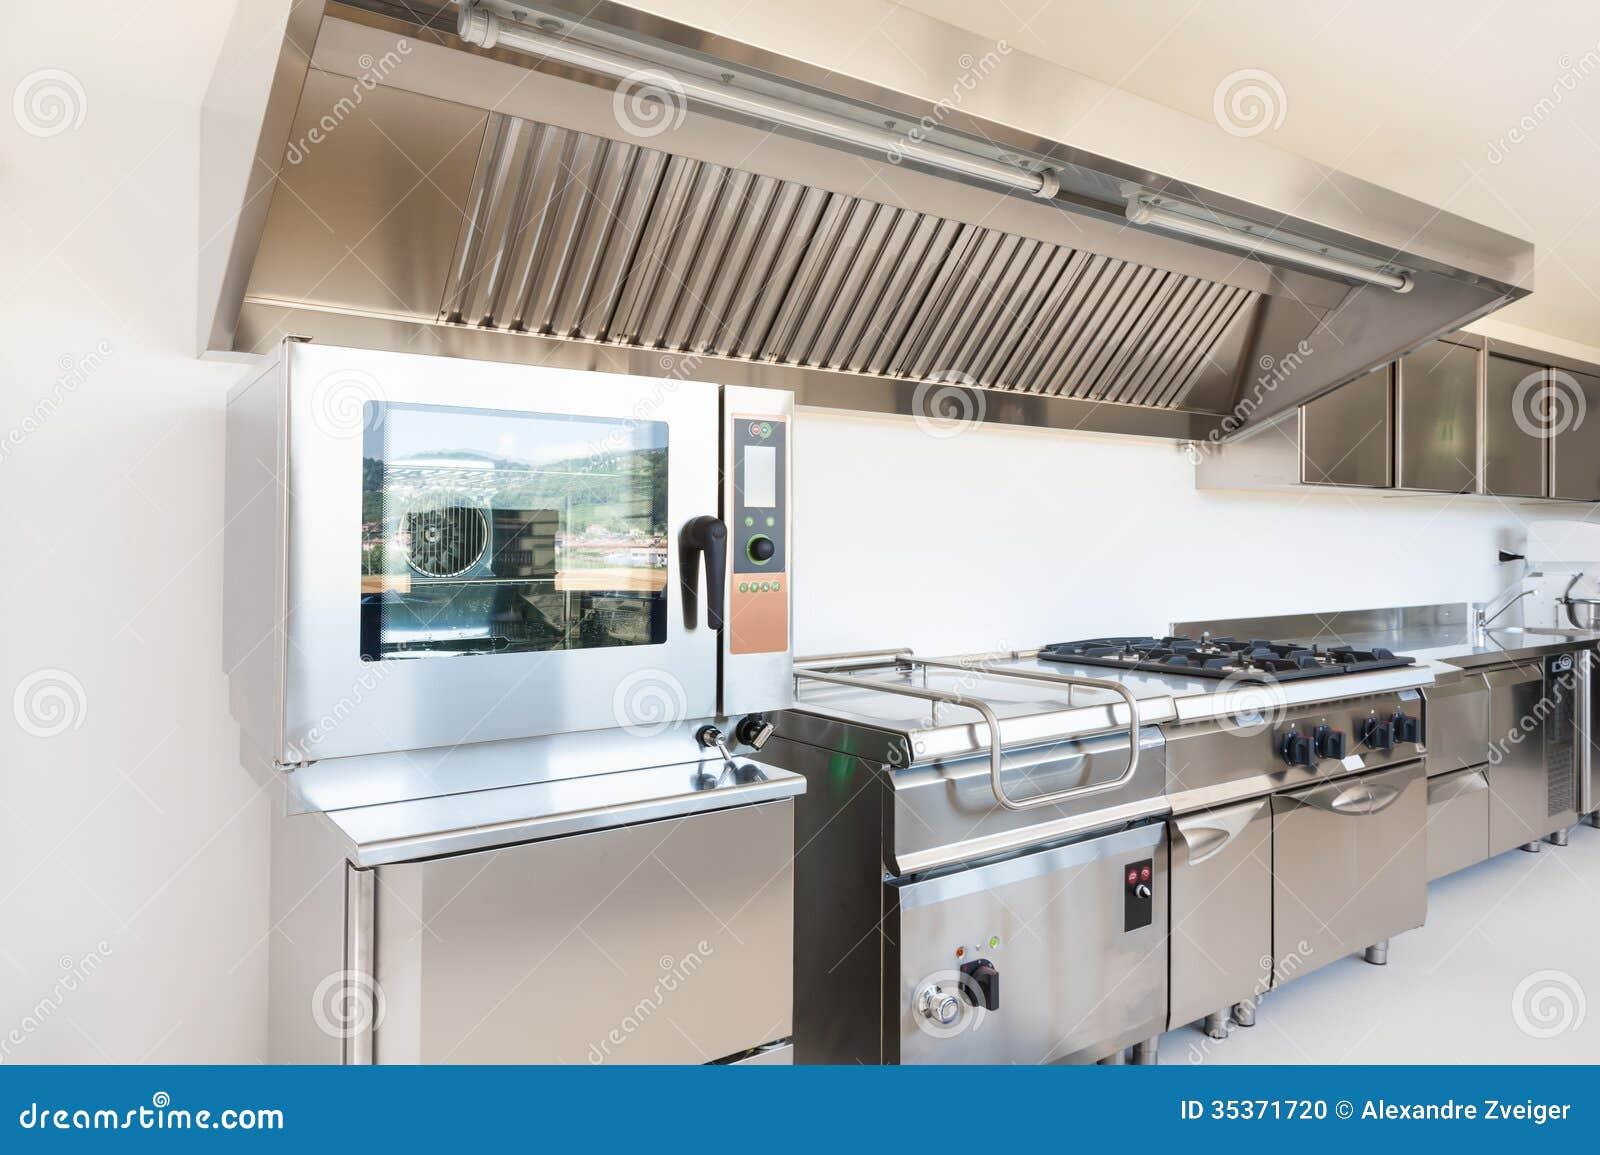 professional kitchen stock photo image 35371720